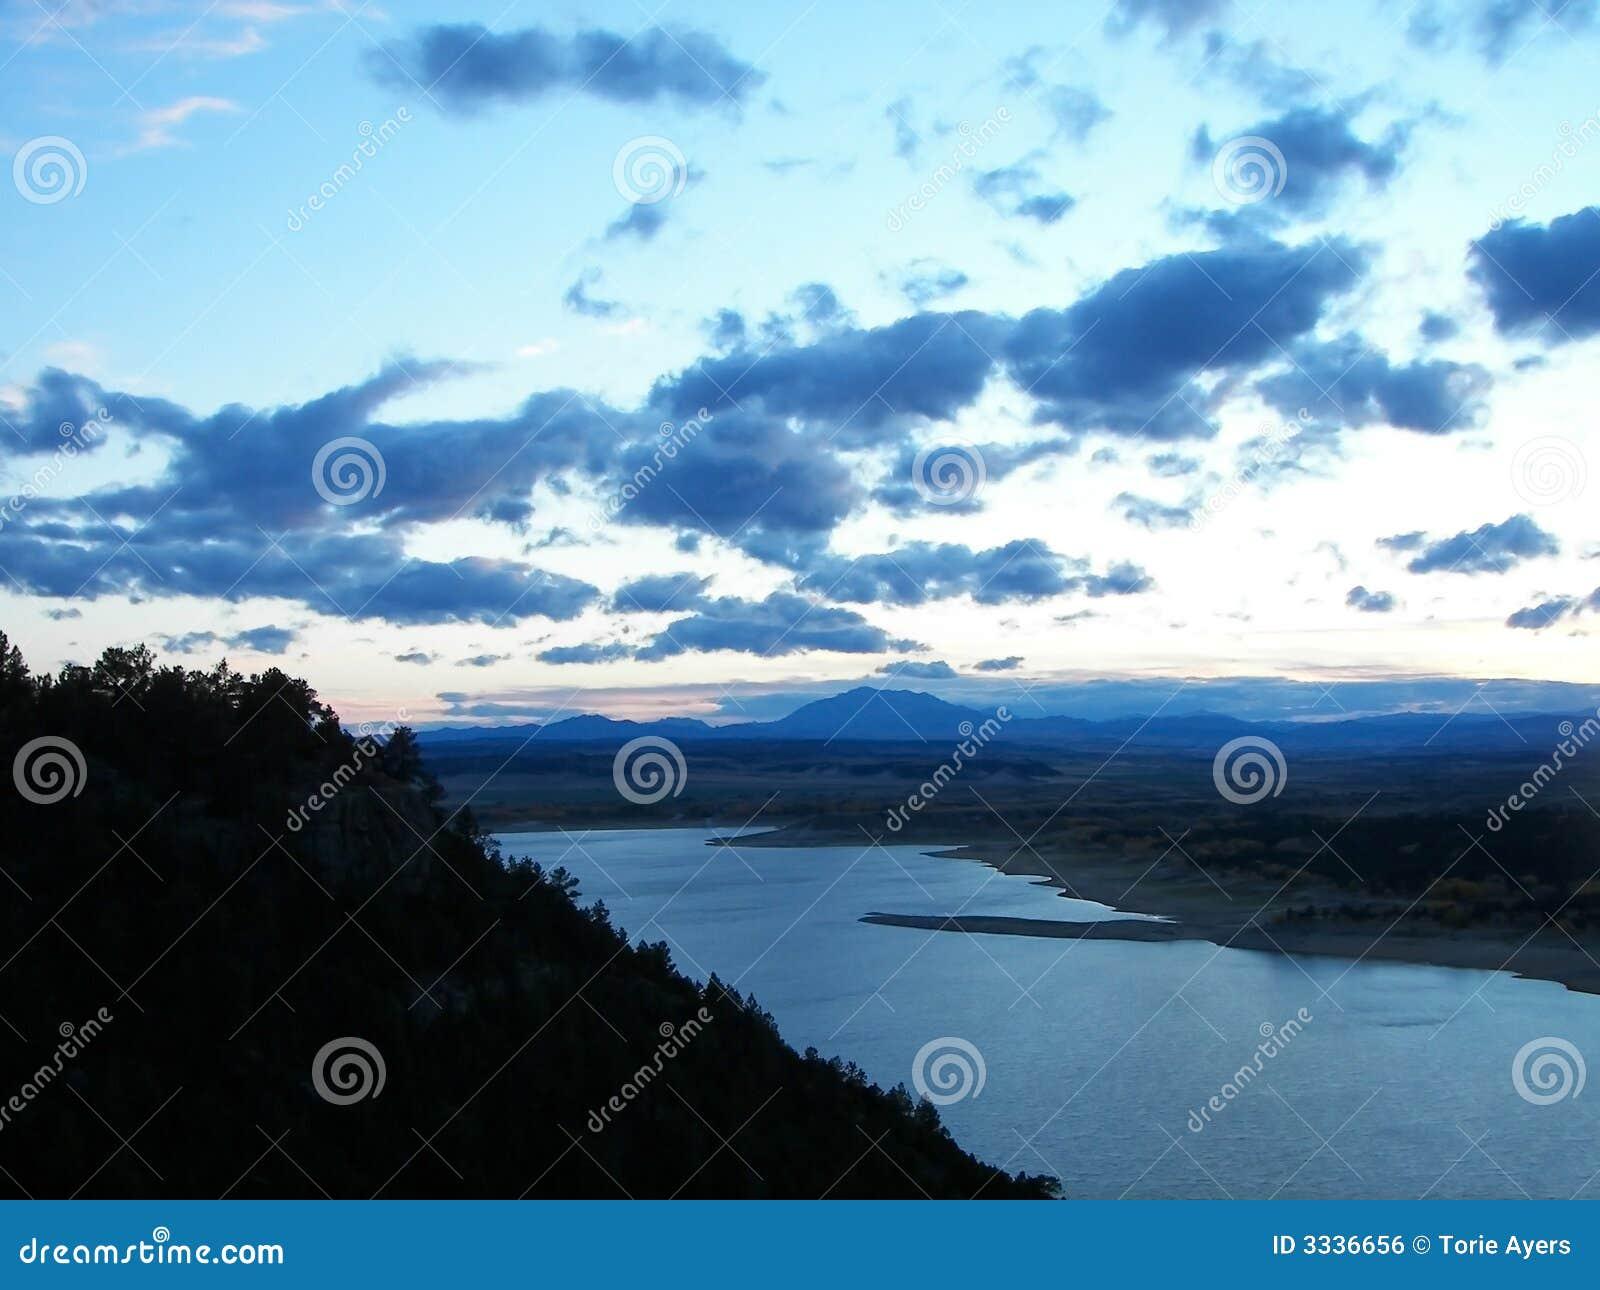 Bright blue sunset